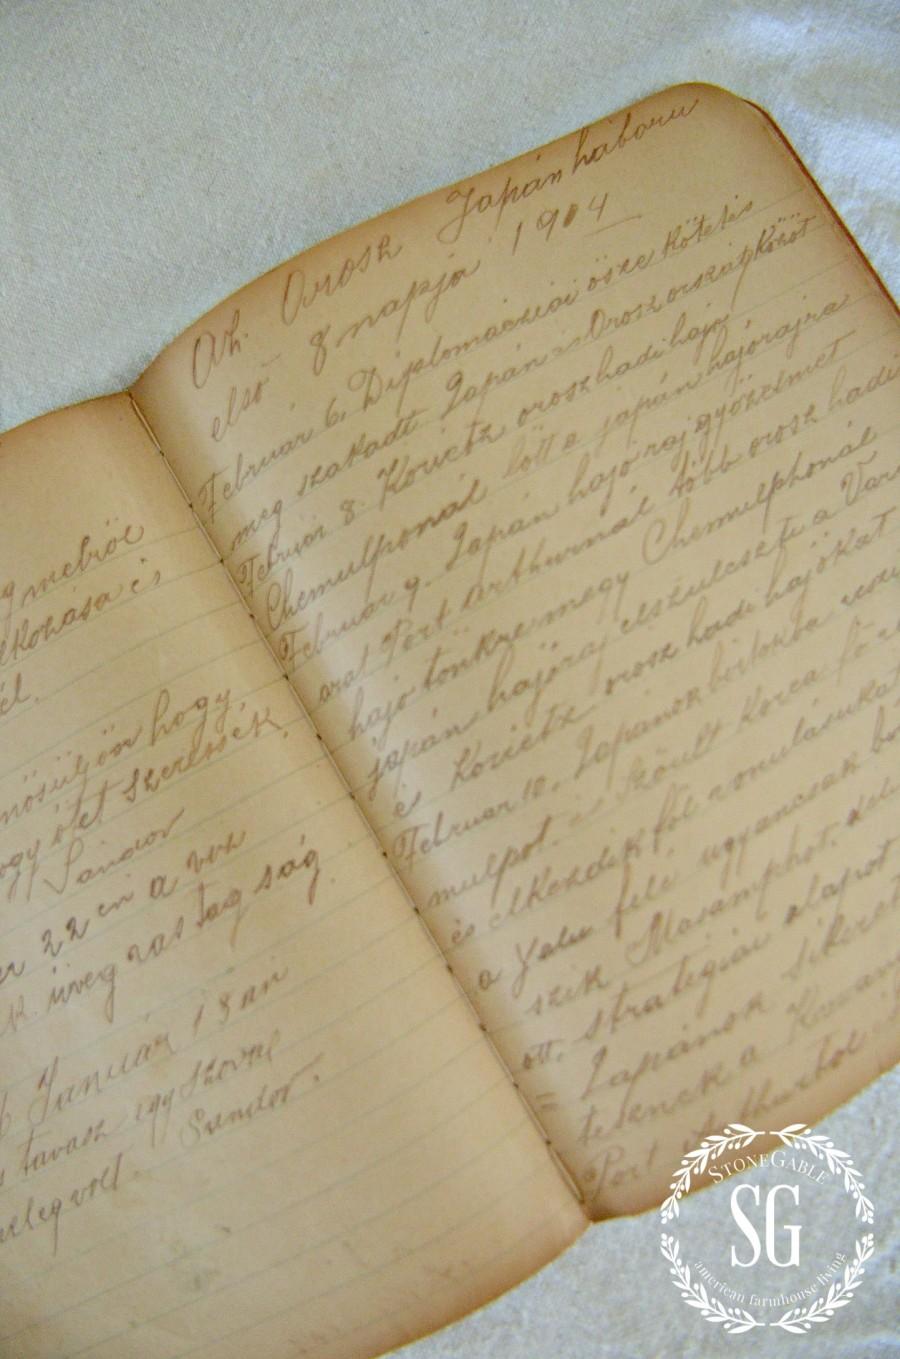 DISPLAYING FAMILY TREASURES- great grandfather's writings-stonegableblog.com